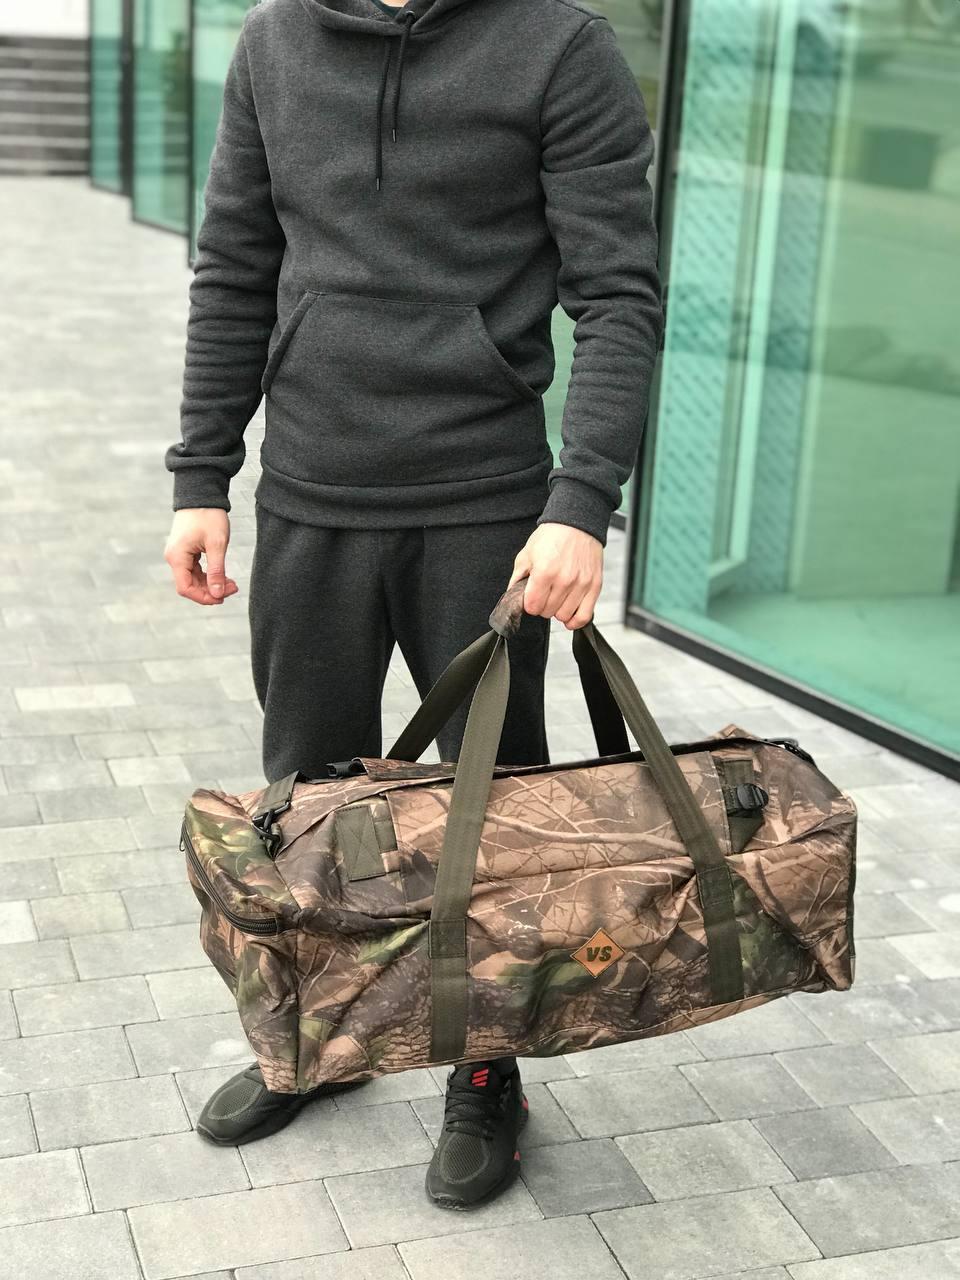 Дорожная сумка-рюкзак, камуфляжная (60 л.)